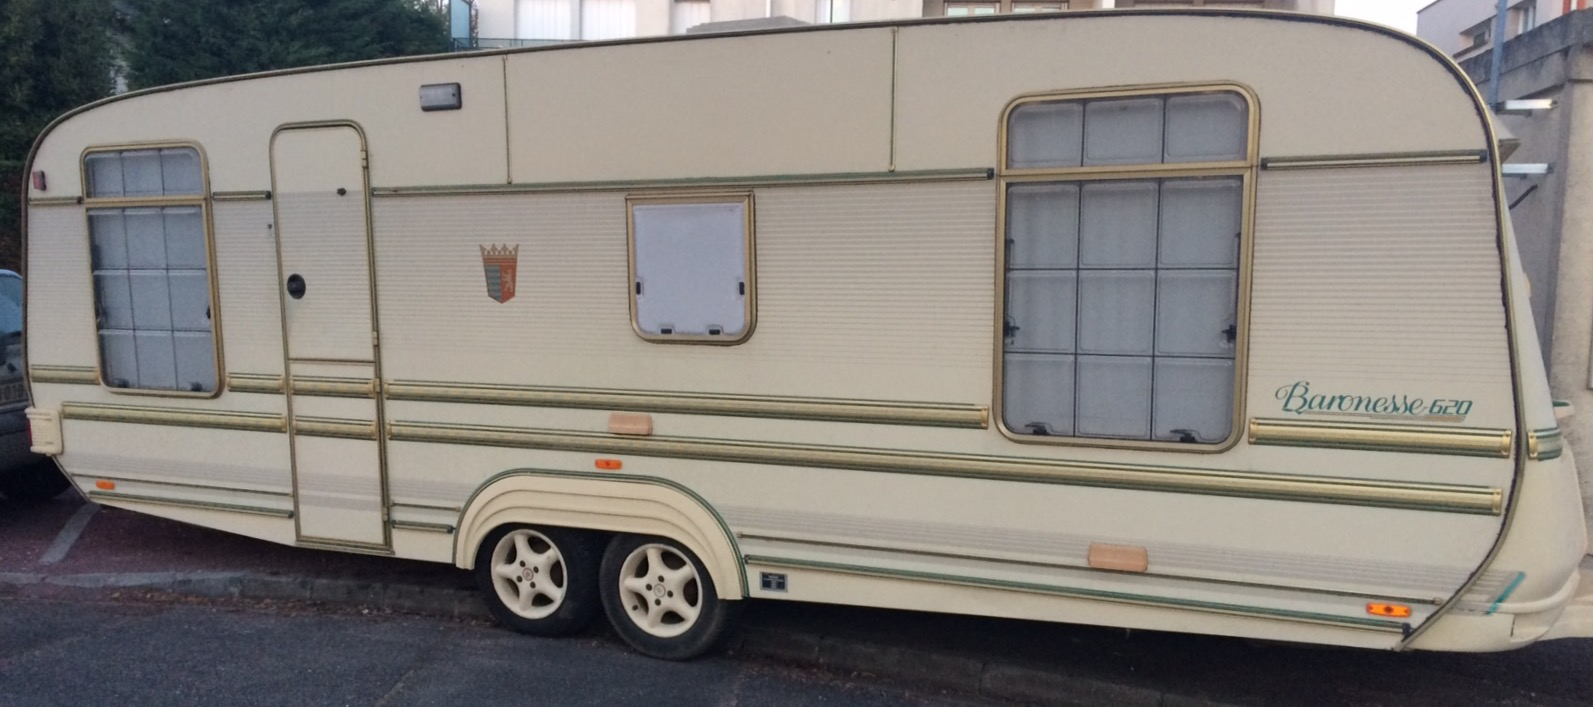 Caravane occasion Tabbert Baronesse 620